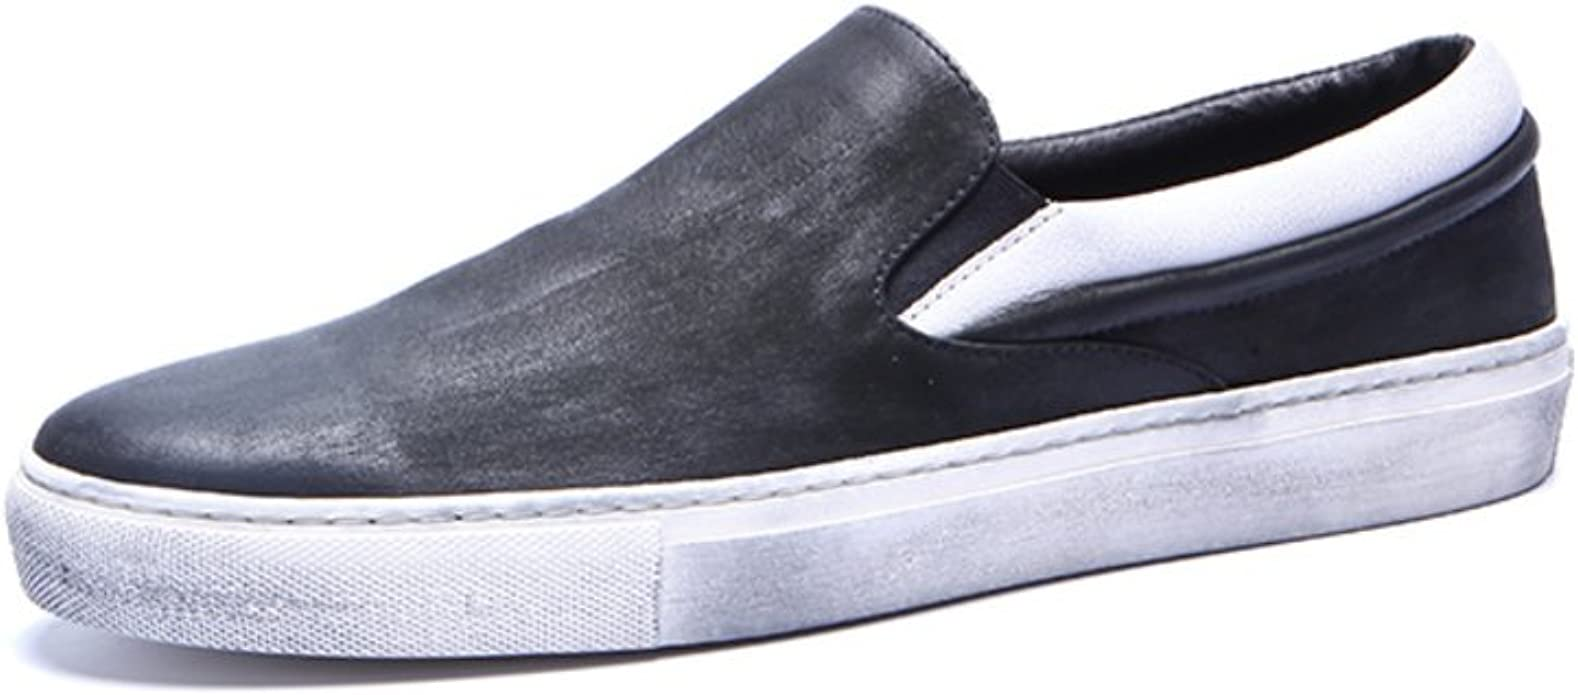 Vintage Zapatos/Le Fu, Zapatos de Moda/señora Verano Zapatos ...